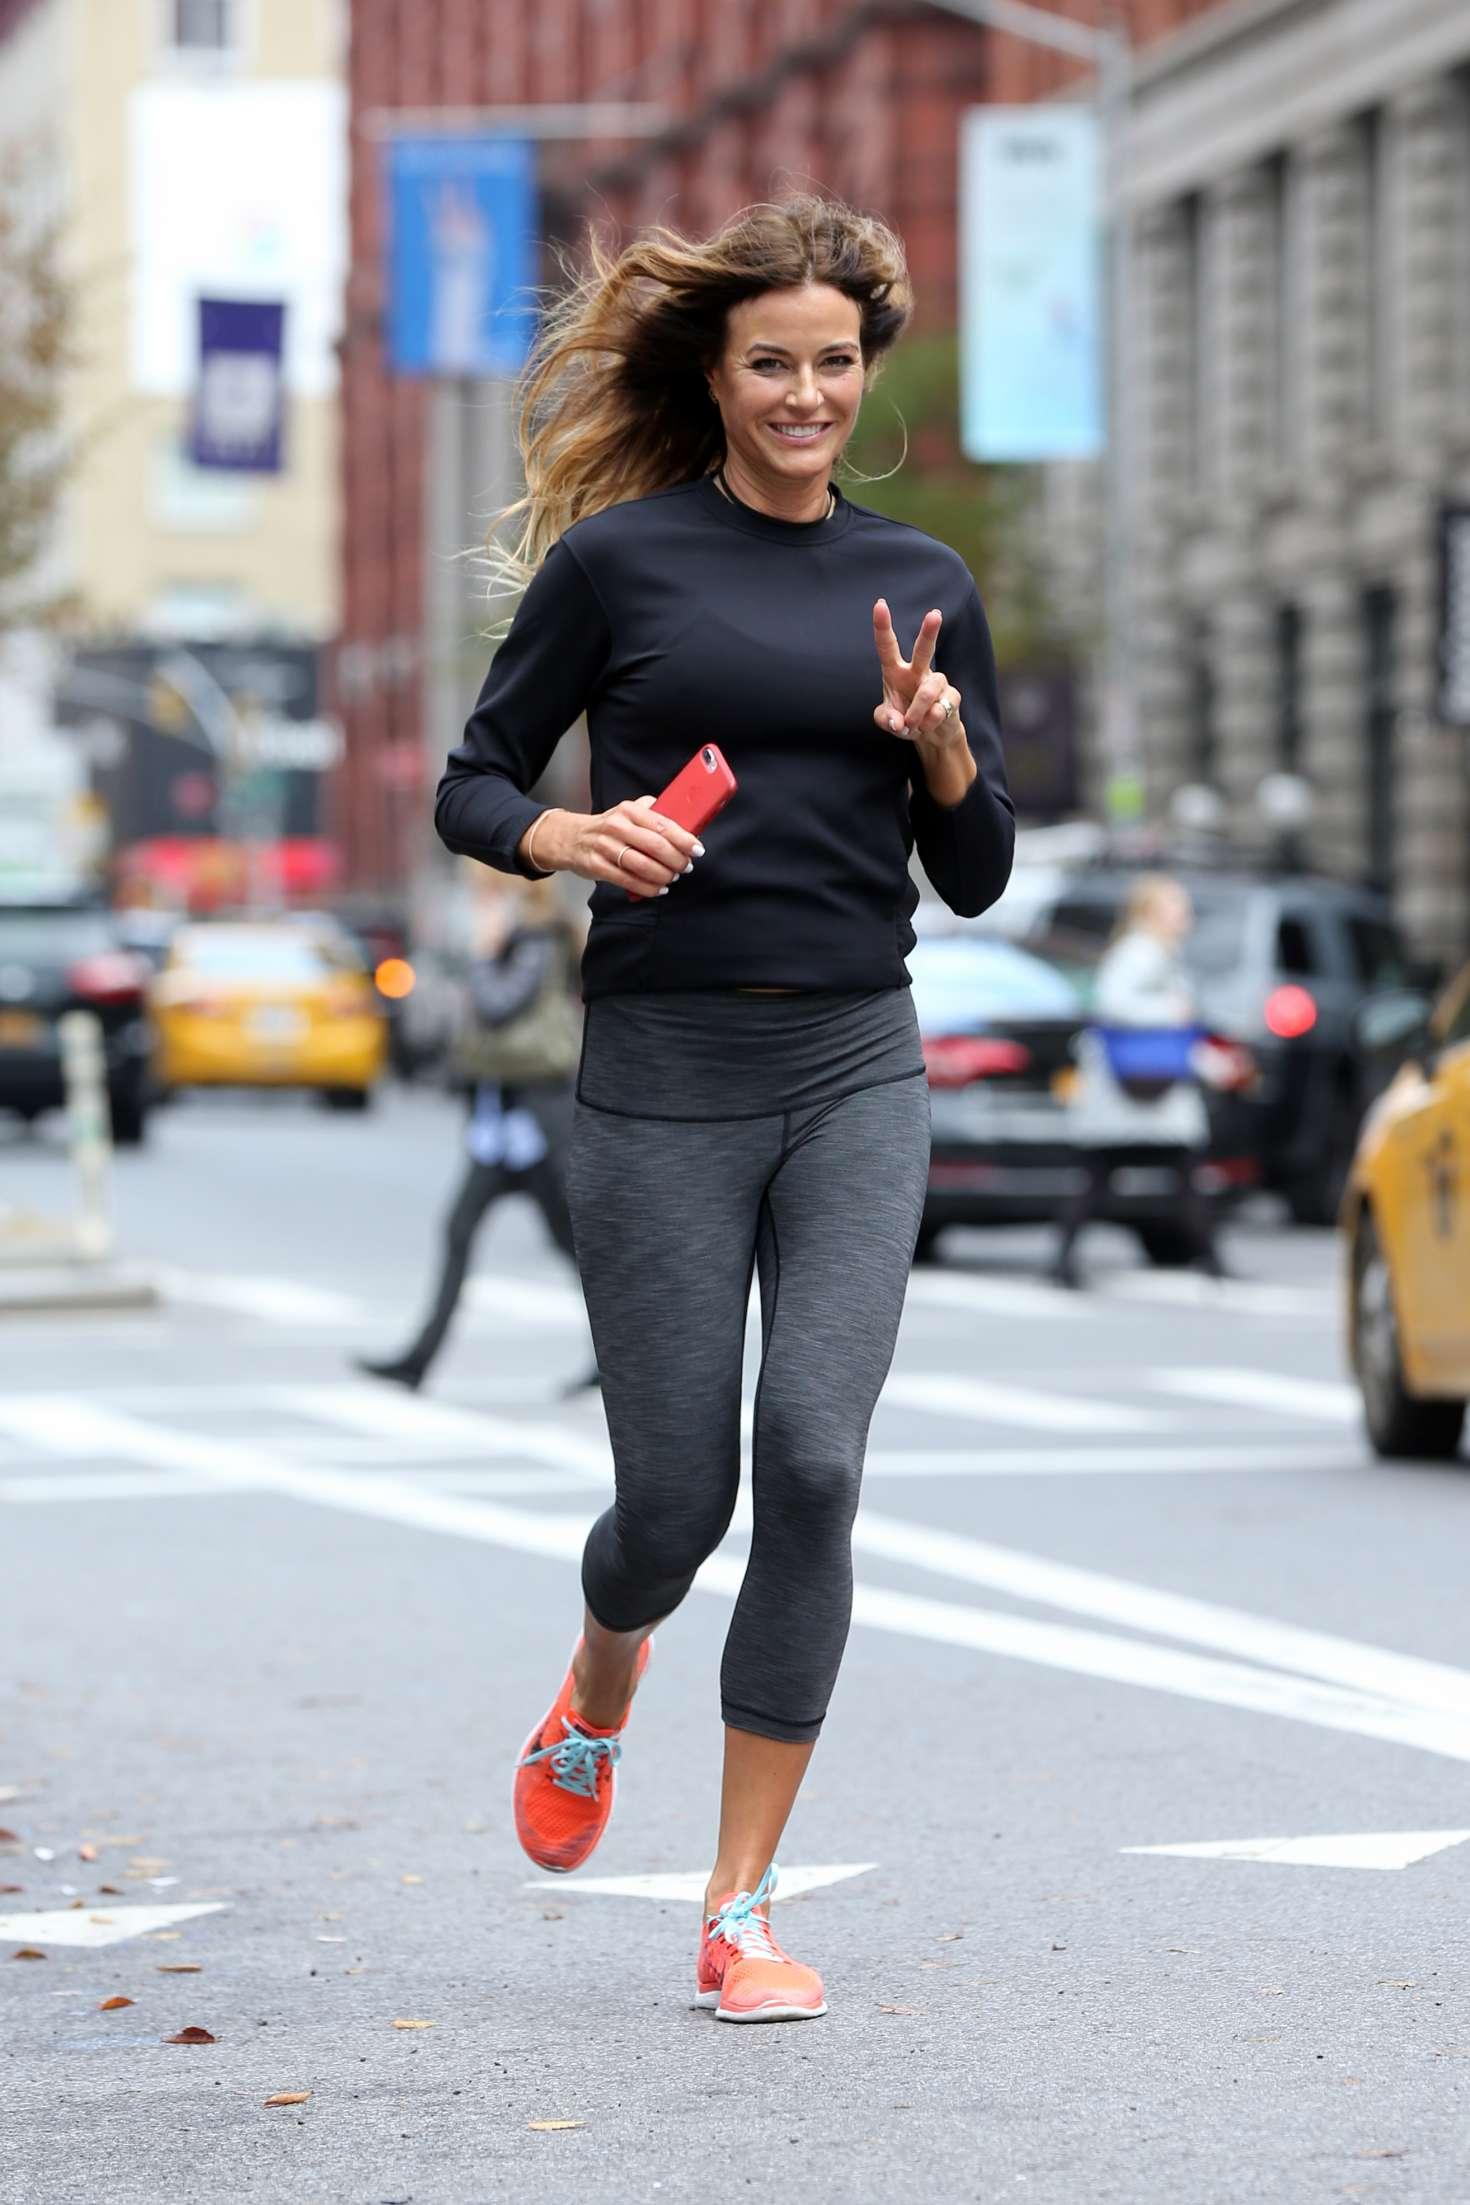 Kelly Bensimon 2017 : Kelly Bensimon: Goes for a jog in NYC -02